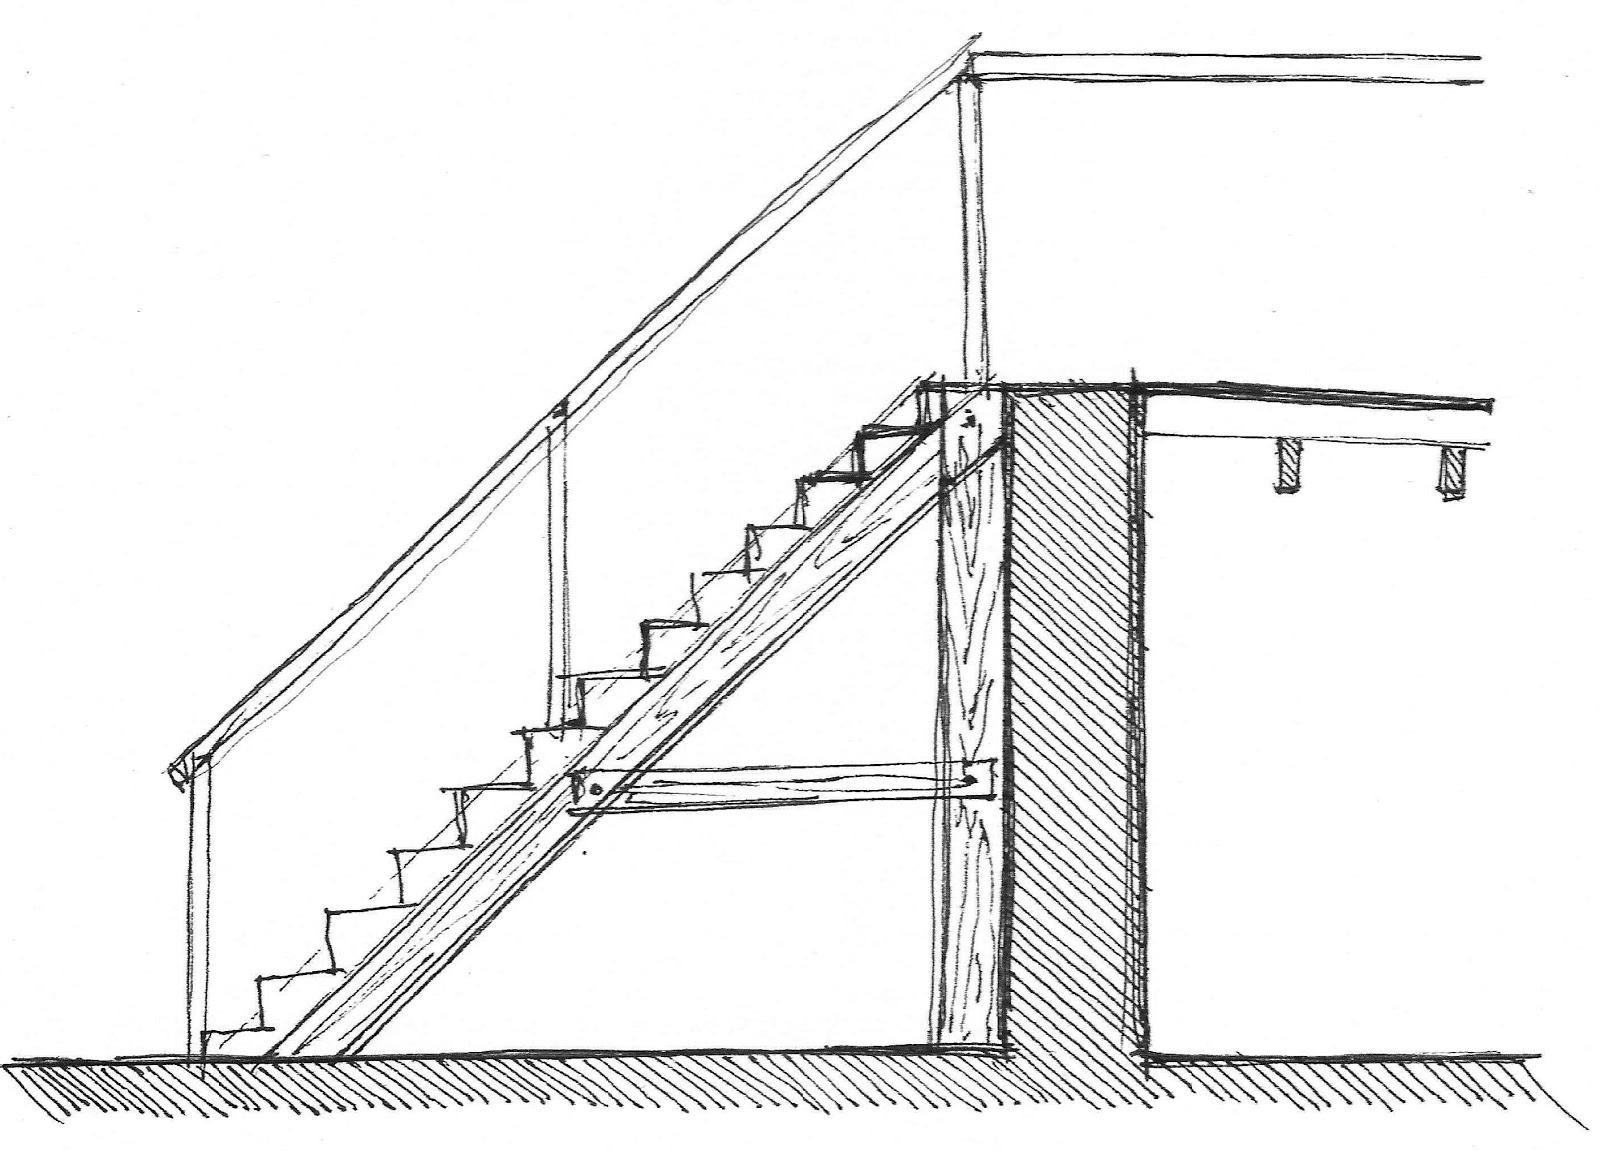 Ipat2013 franciscotorresrico grupoa1 volumetr a de la for Como iluminar una escalera